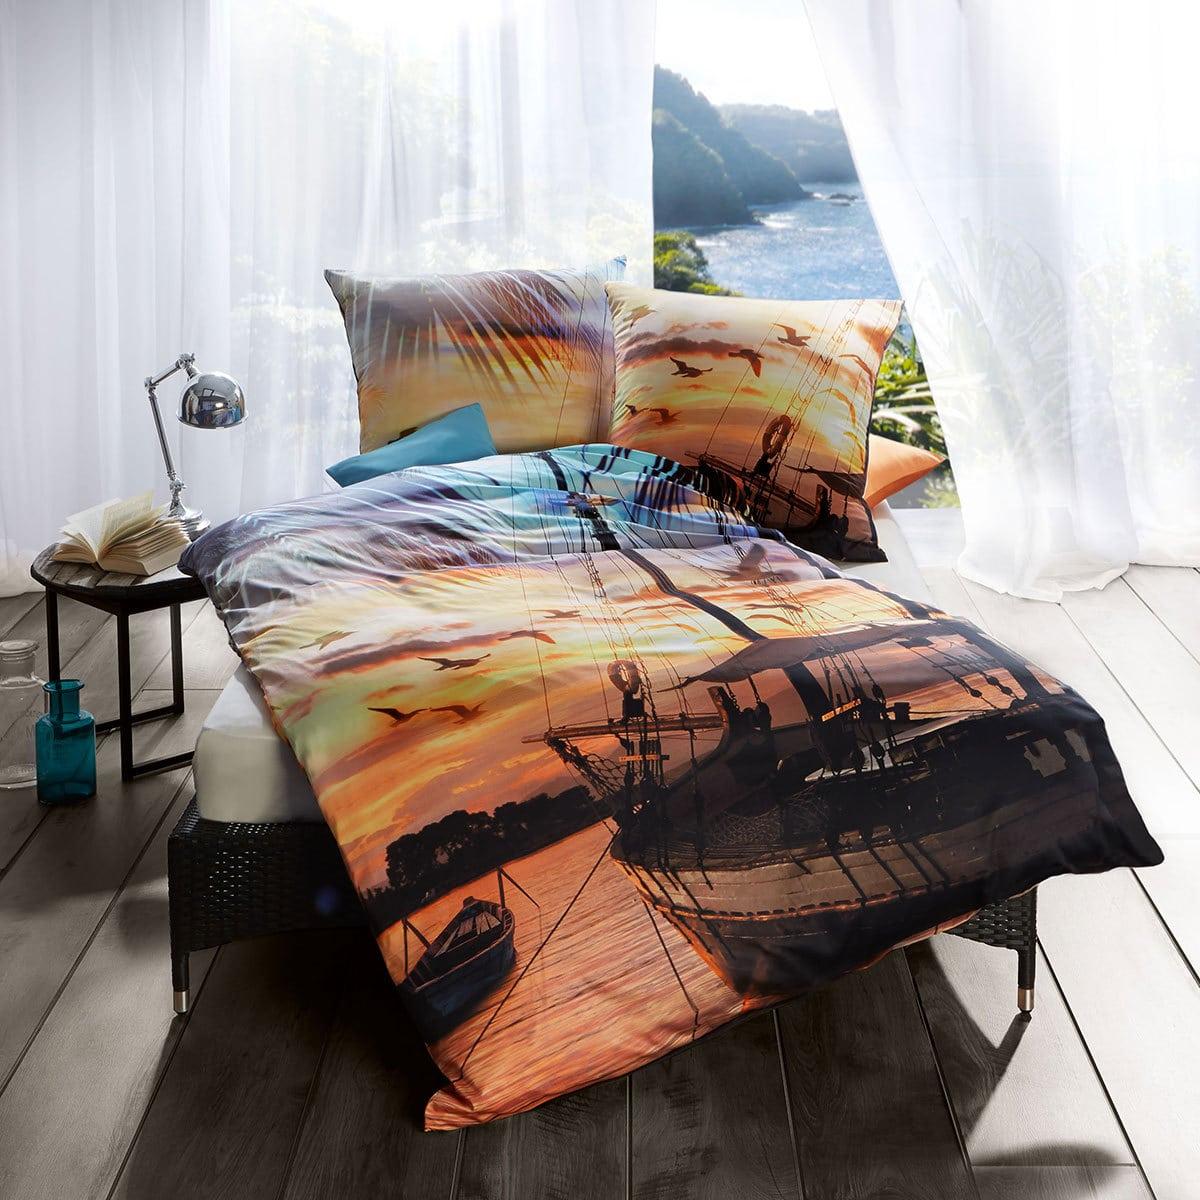 kaeppel mako satin bettw sche sail away g nstig online. Black Bedroom Furniture Sets. Home Design Ideas